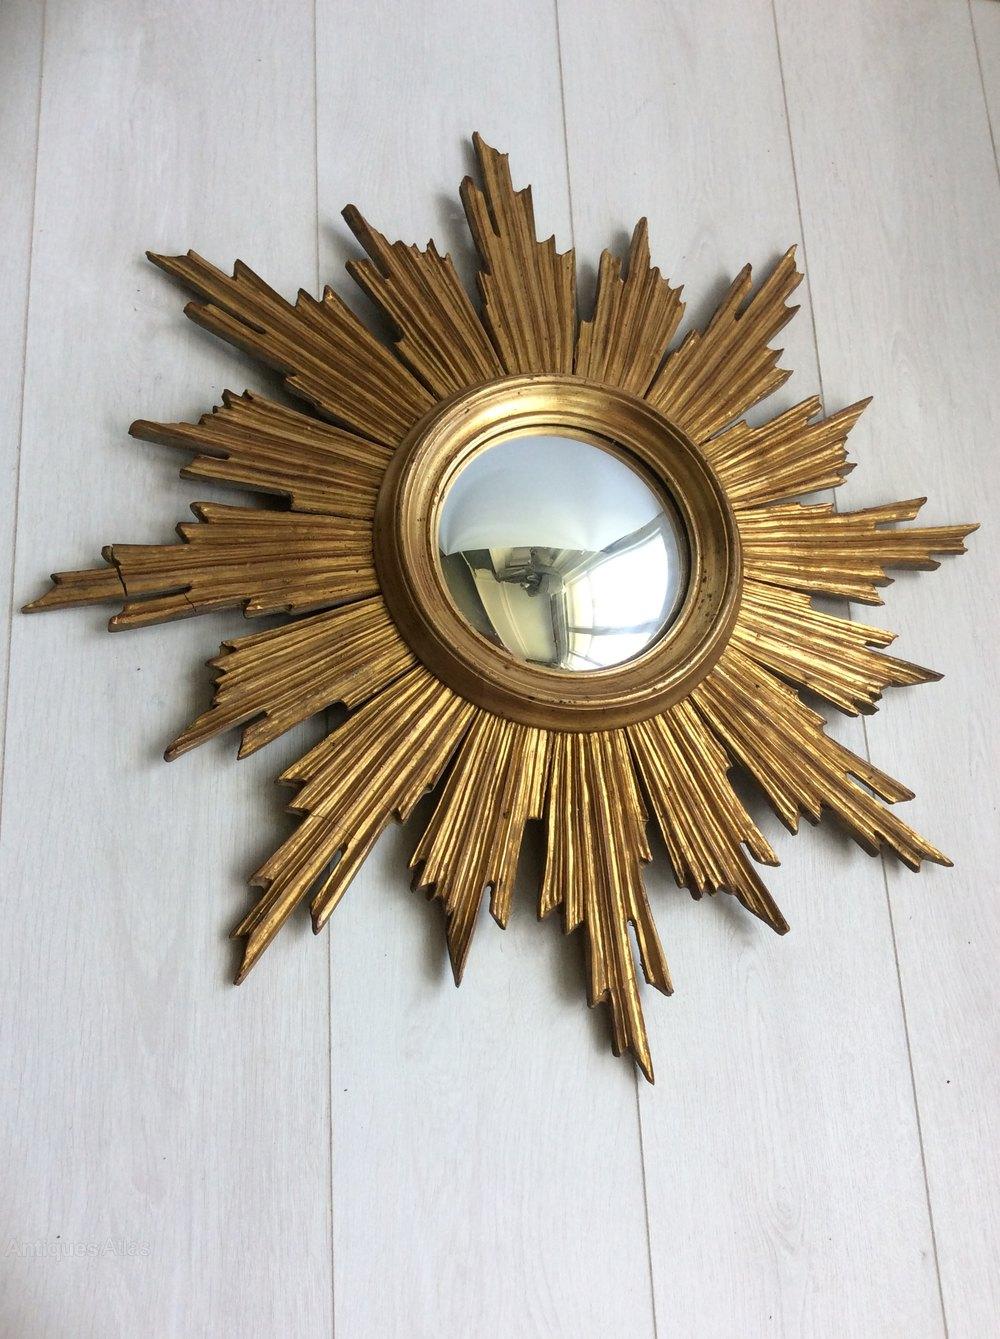 Vintage Giltwood Sunburst Convex Mirror Antique Mirrors